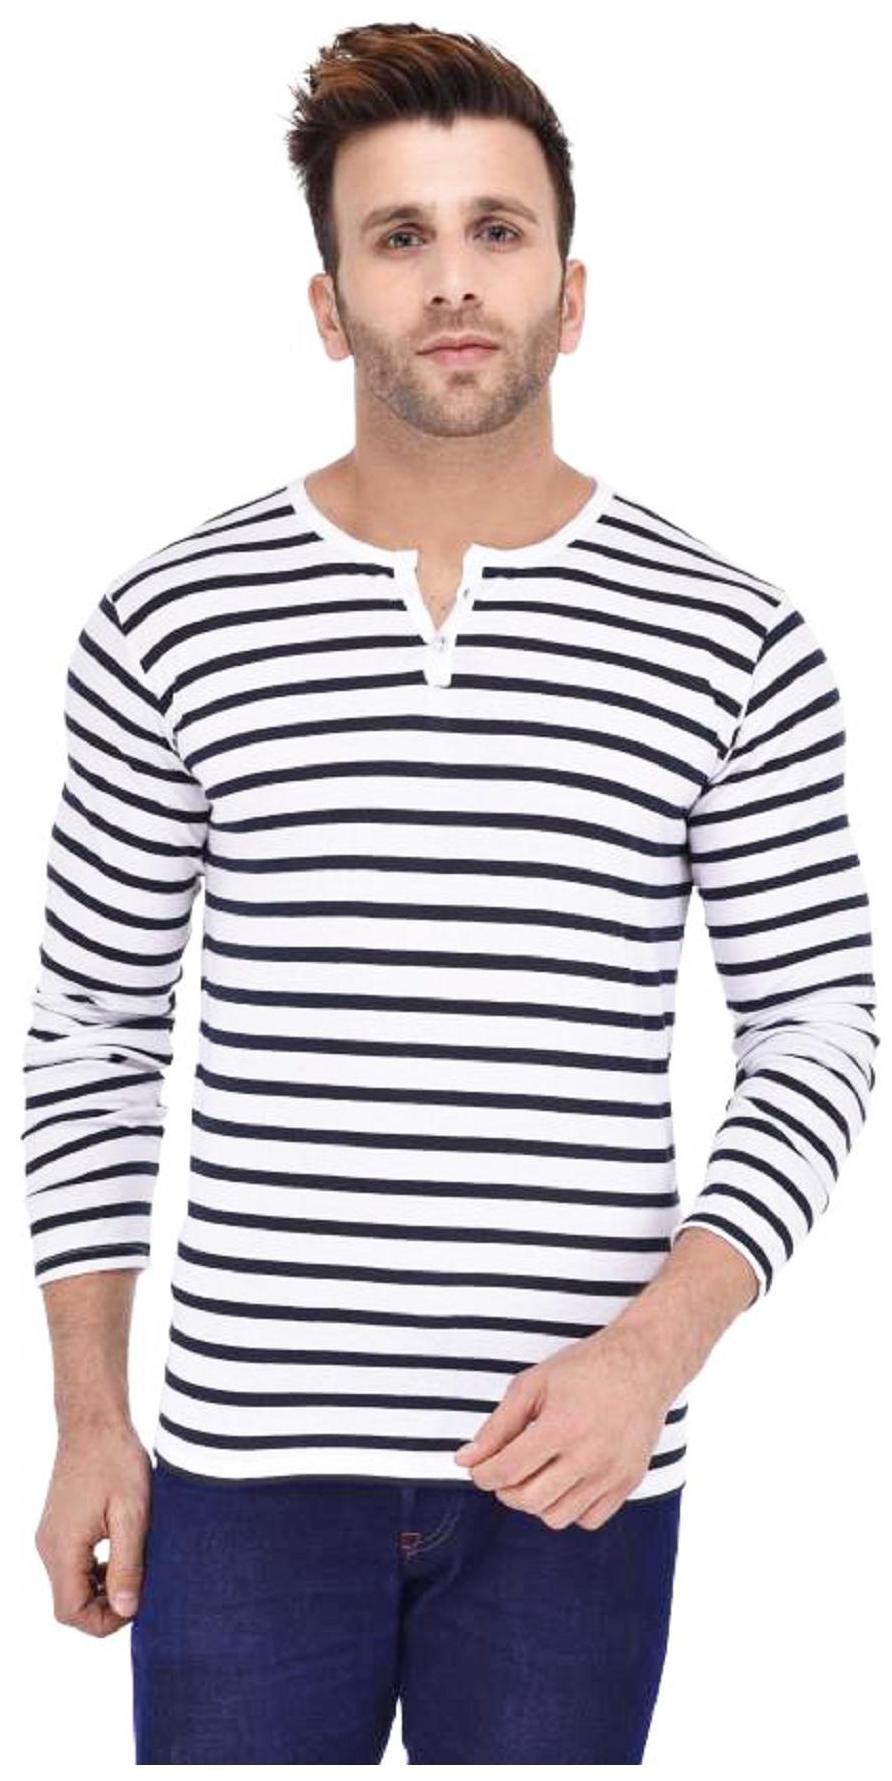 J2J Round Neck White Blue Striped Tshirt